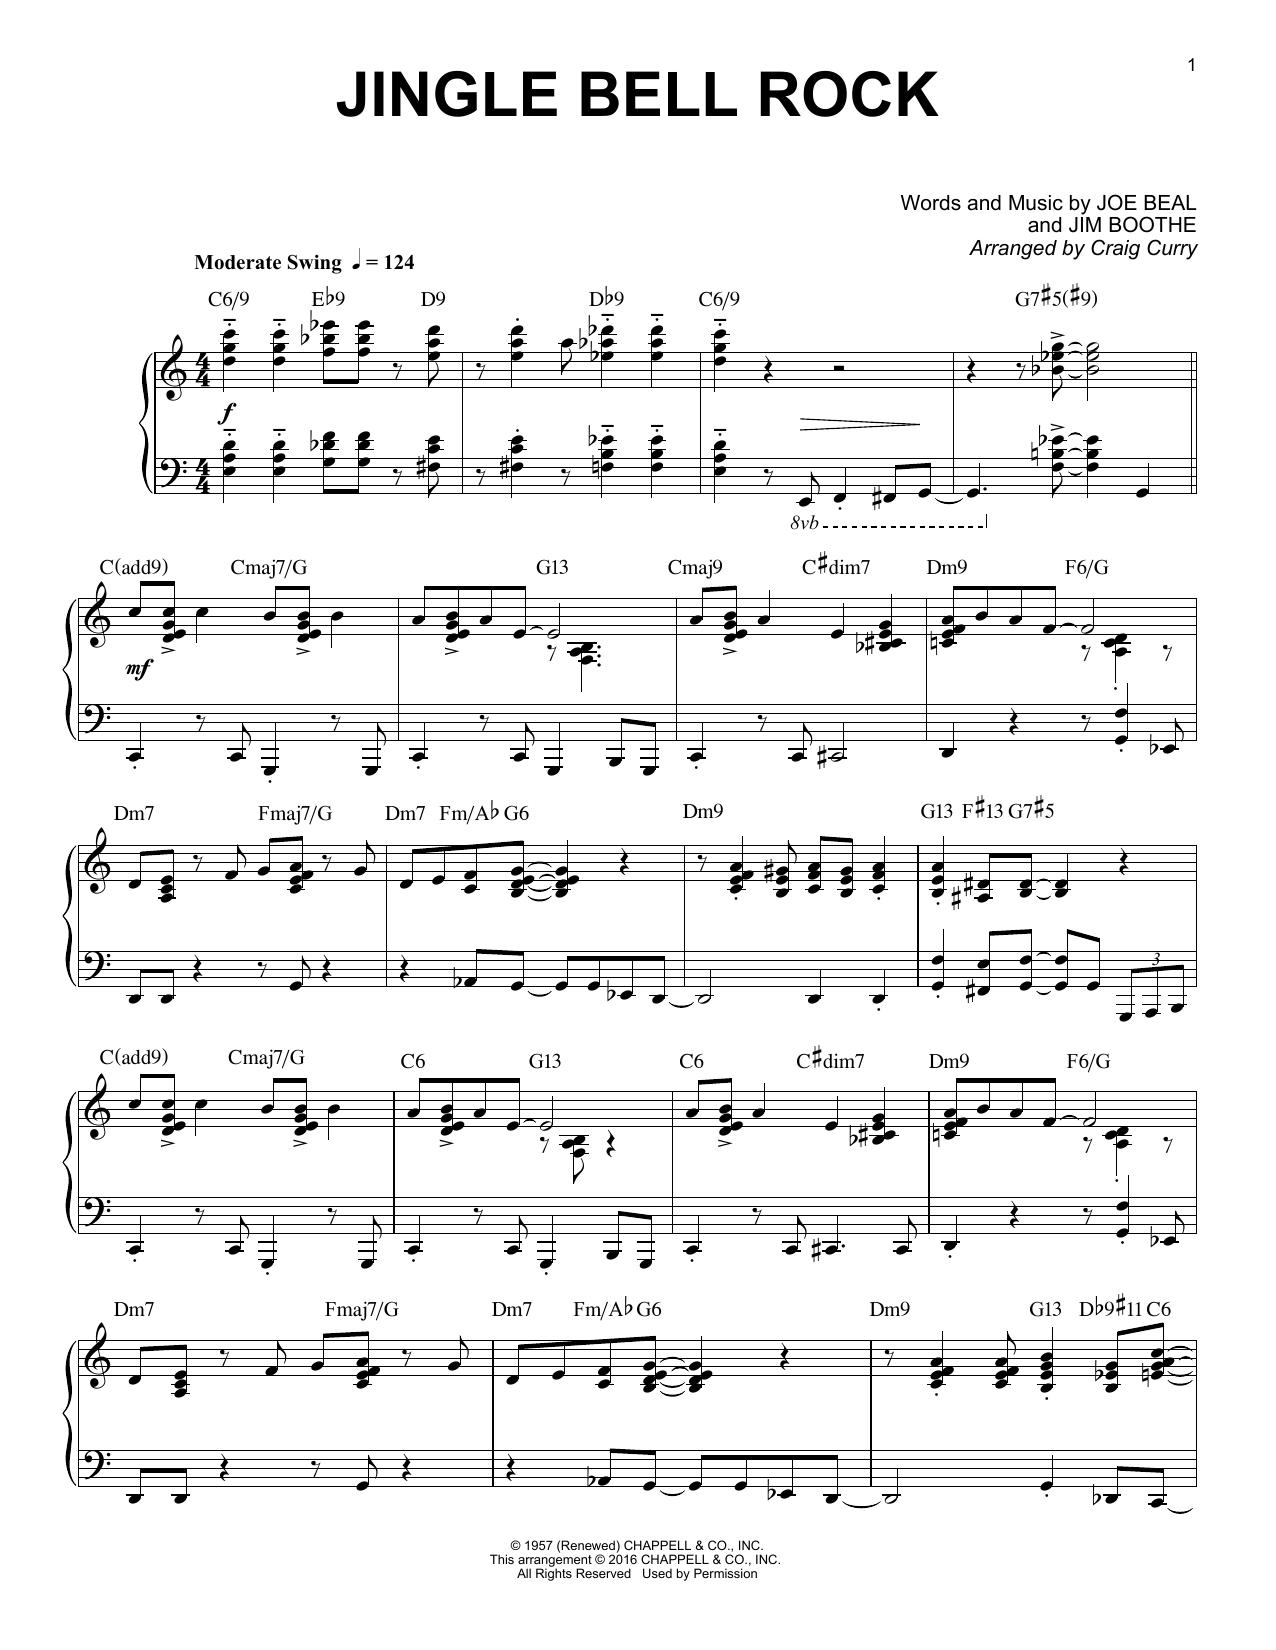 Partition Piano Jingle Bell Rock De Craig Curry